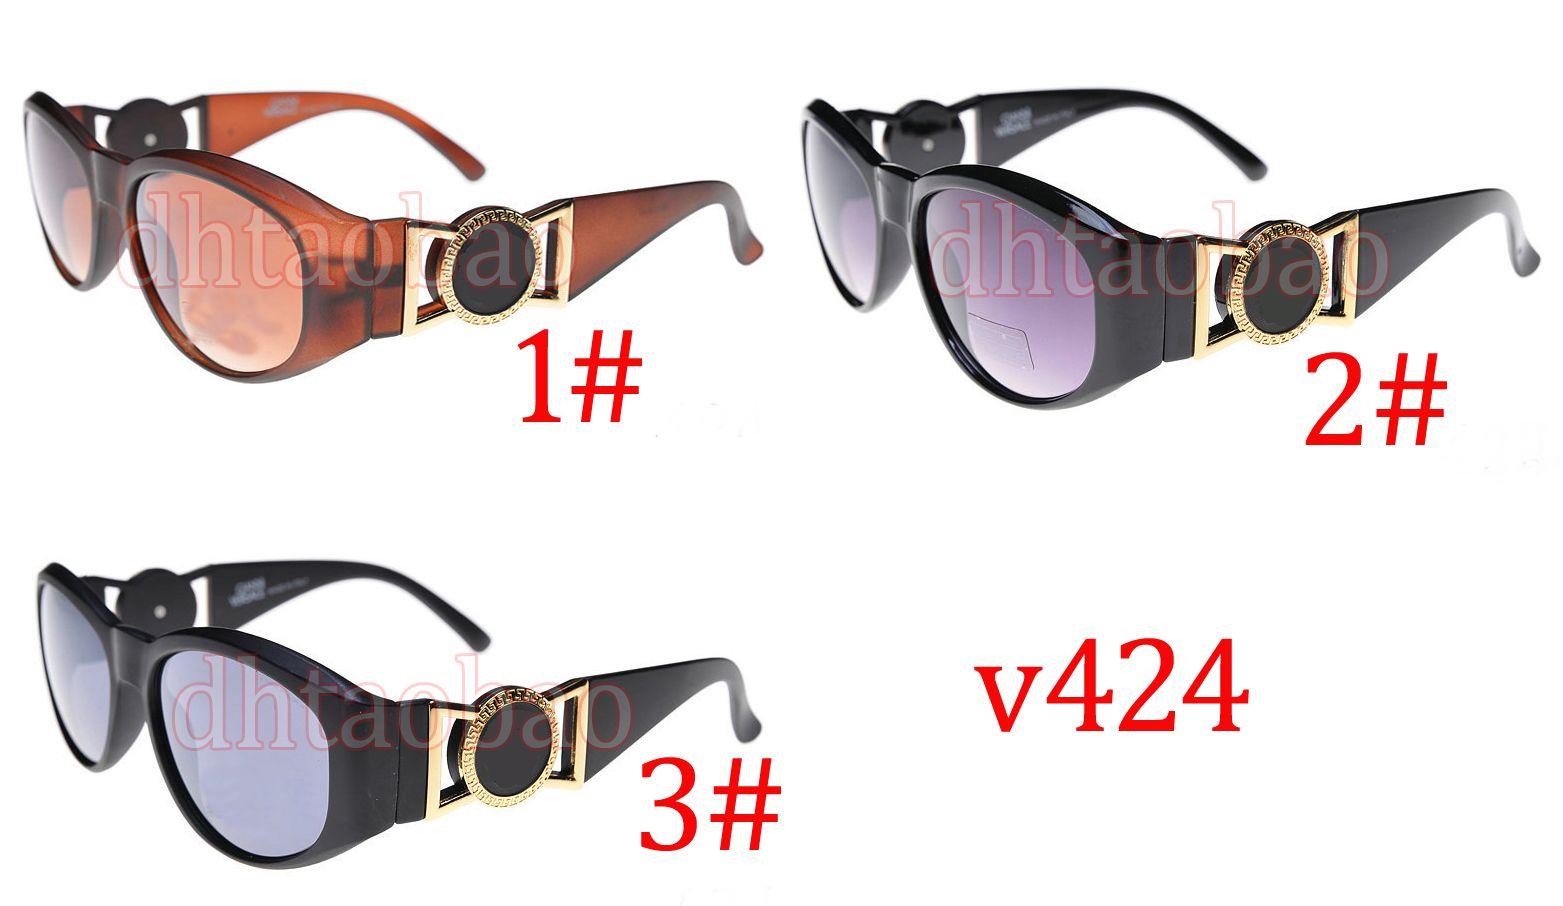 Moq=10pcs Unisex Sun Glasses Fashion Sunglasses Vintage Frog Glasses Black Wide Frames Over sized Lens Frame Eye wear 3 Colors Shipping